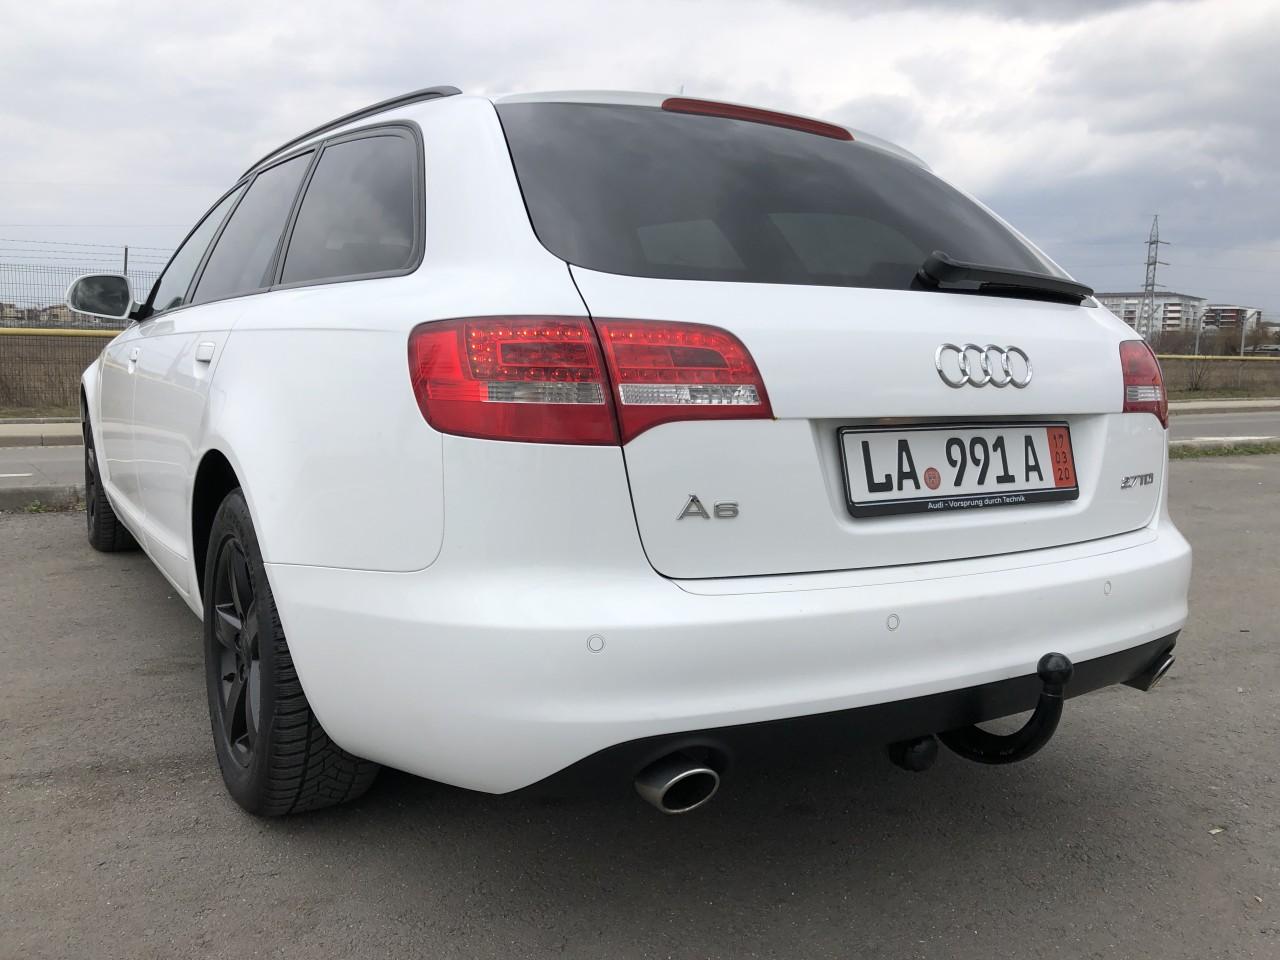 Audi A6 AUDI A6  Facelift Full LED Euro 5/2.7 TDI 190 Cp /Automata/NAVI Mare/Xenox/Piele/Senzori parcare fata+spate/6 CD/Bluetooth/Pilot…RECENT ADUSA DIN GERMANIA!!! 2009